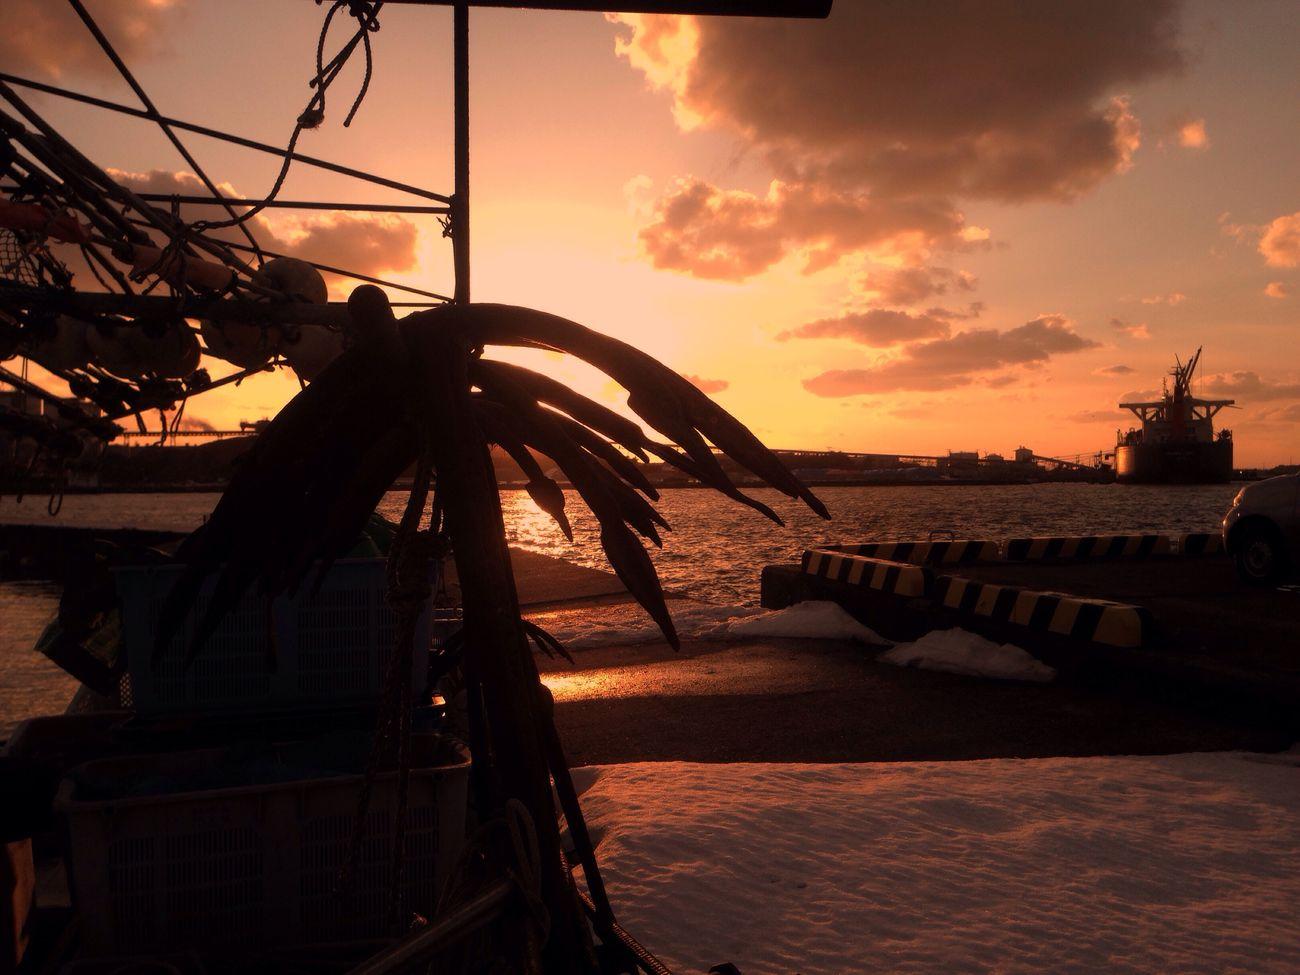 IPhone IPhoneography Mobilephotography Sanset Horizon Over Water Light And Shadow Sanset Collection EyeEm Nature Lover EvningGlow Sunset Sky Beauty In Nature Sunbeam Evning Sky Sunlight And Shadow Akita